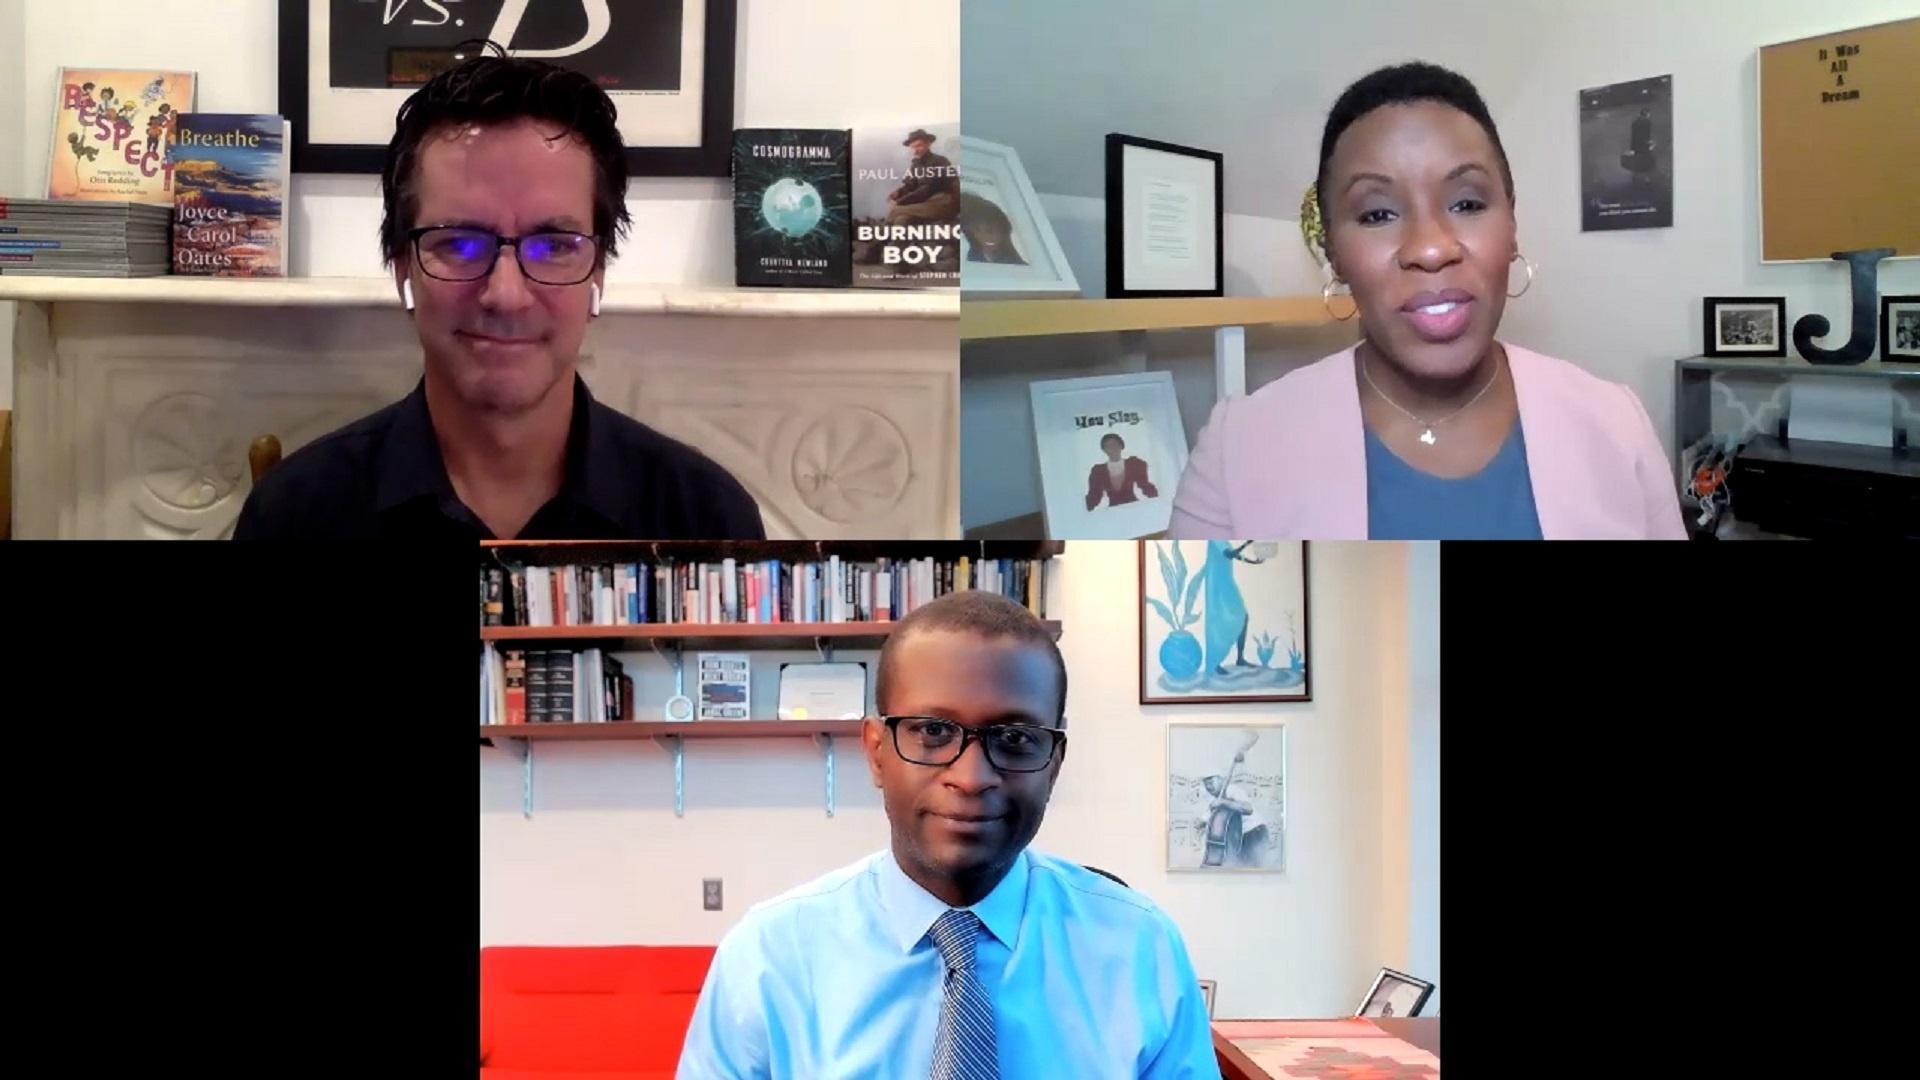 Screenshot of three people on a zoom call: a white man, a Black man, a Black woman